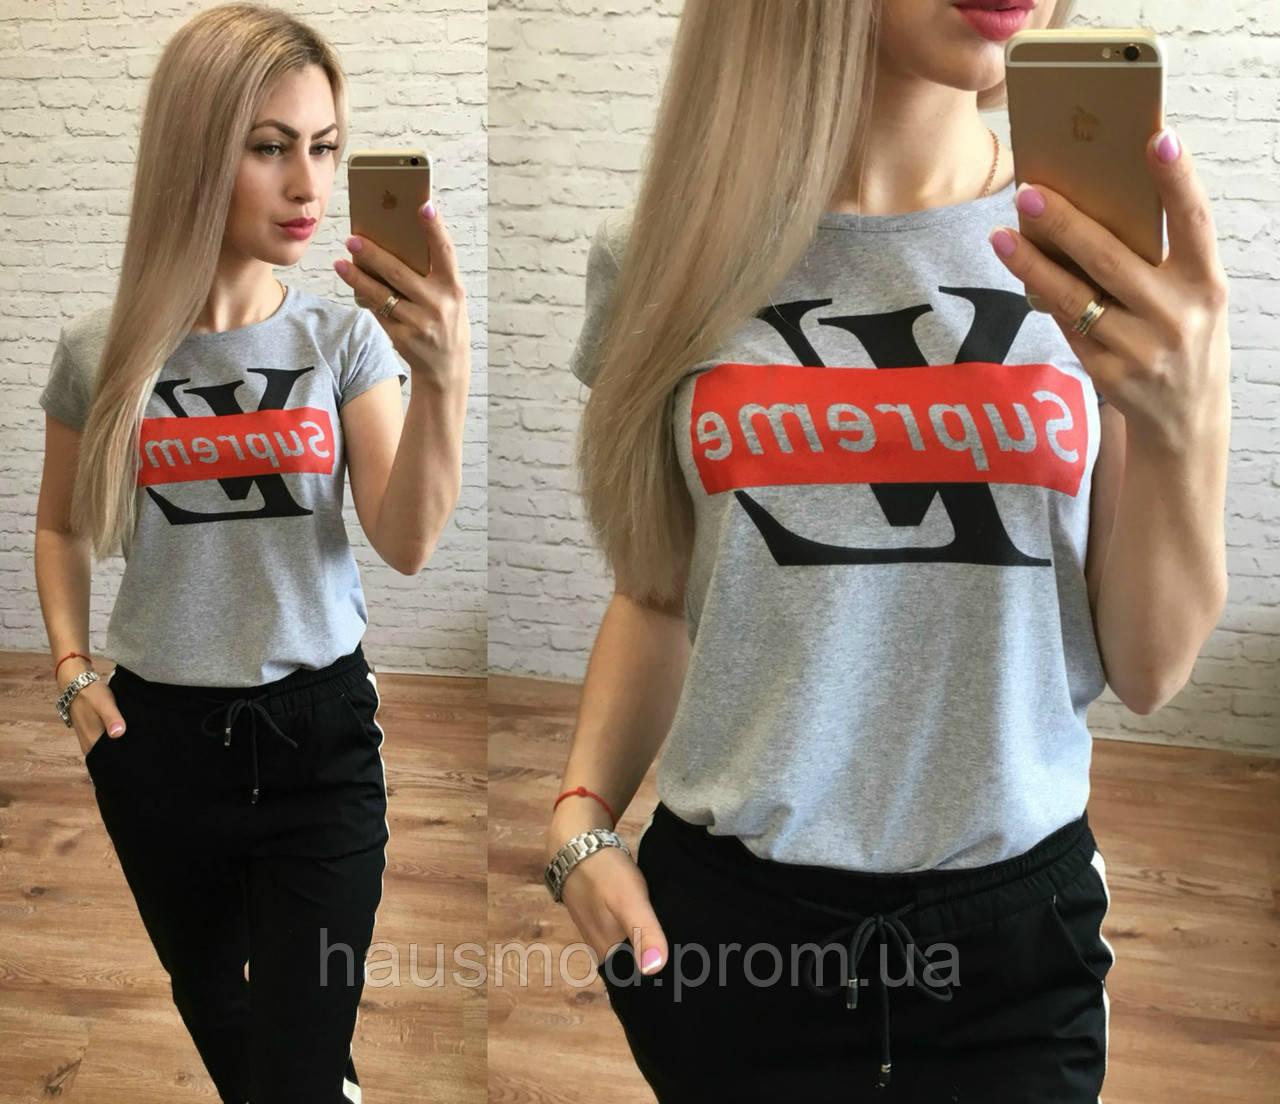 Женская стильная футболка реплика LV Supreme серый меланж